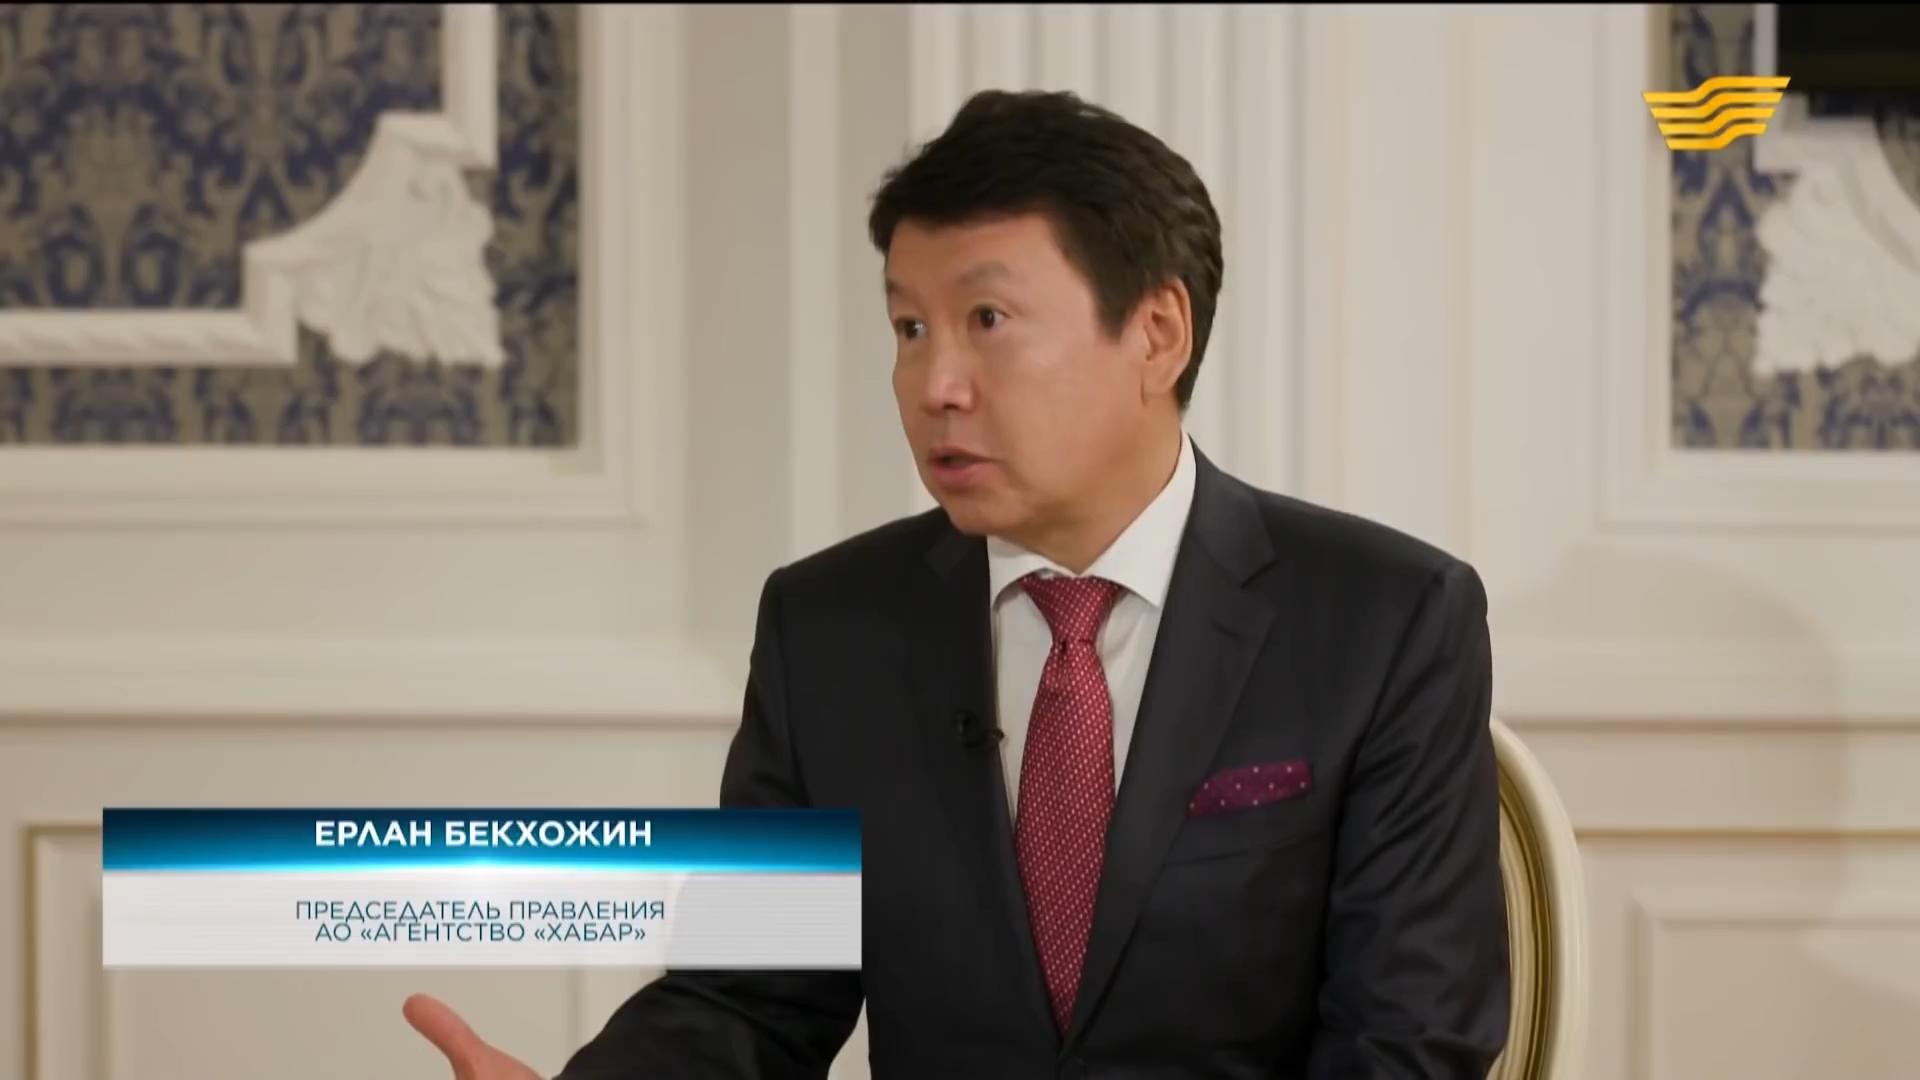 20191022_20-40-Александр Лукашенко дал эксклюзивное интервью телеканалу «Хабар»-scr11a